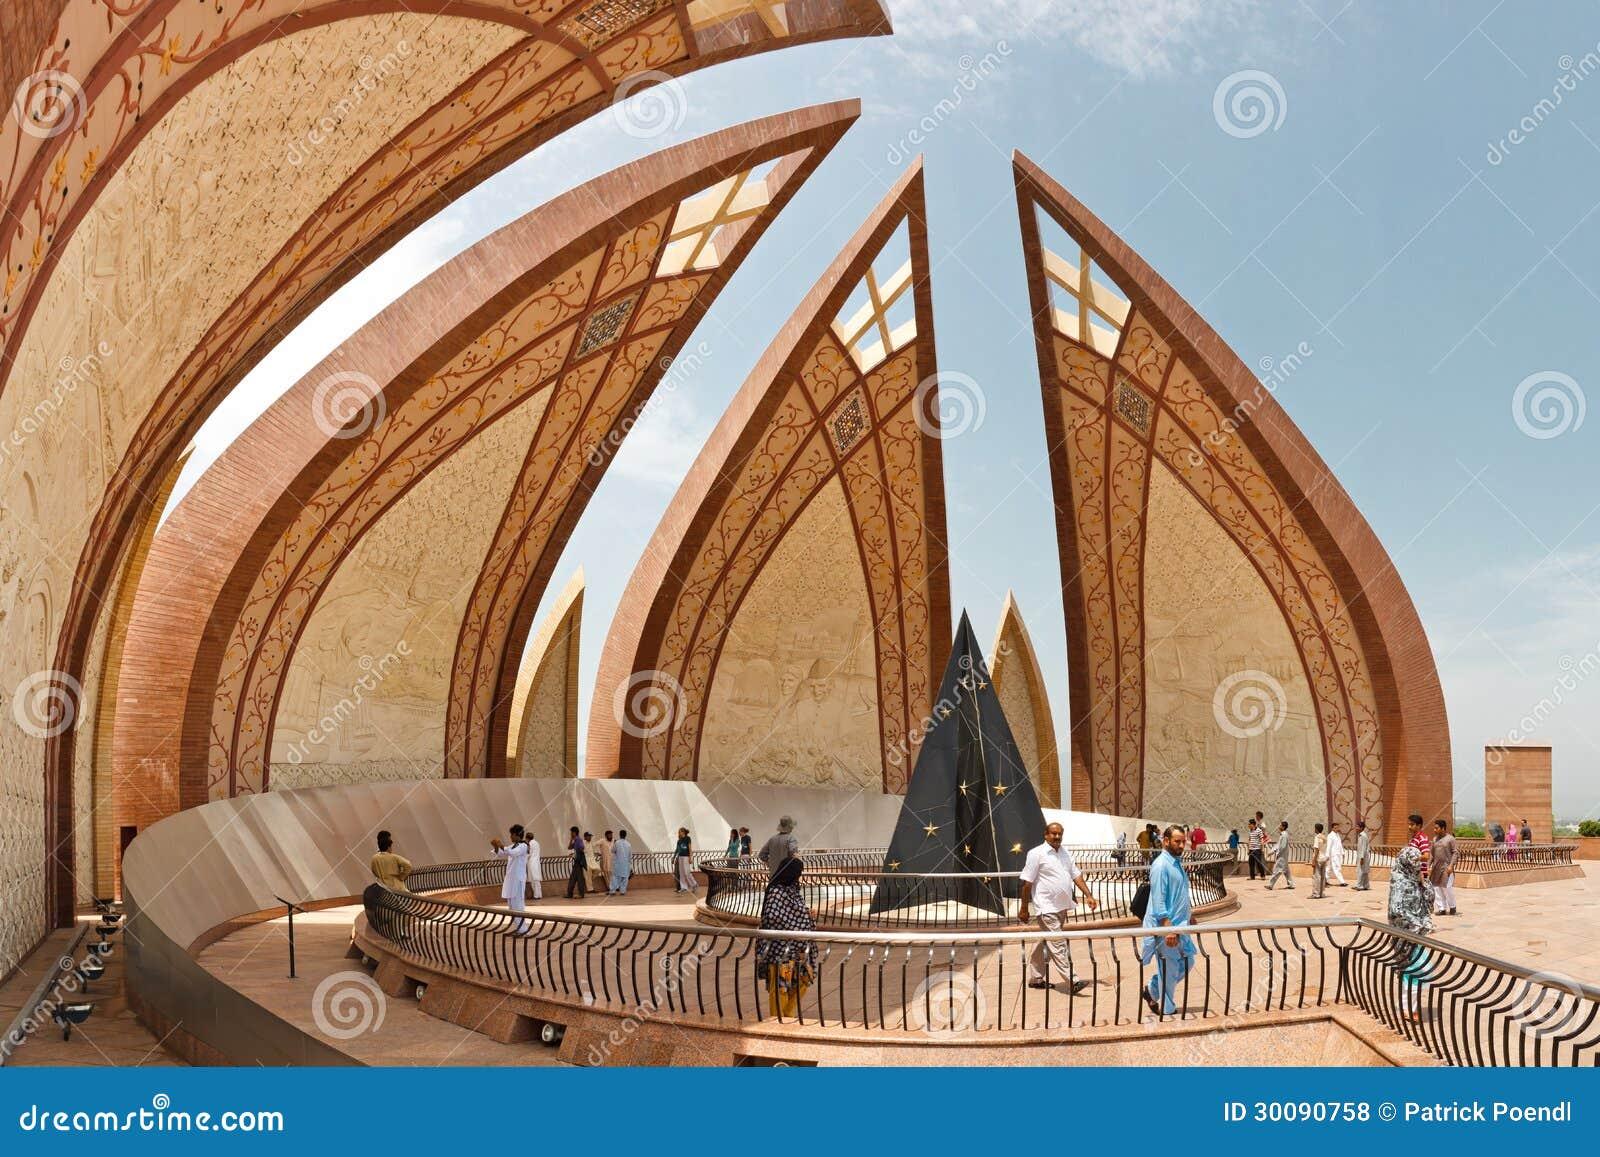 Touristes au monument du Pakistan, Islamabad